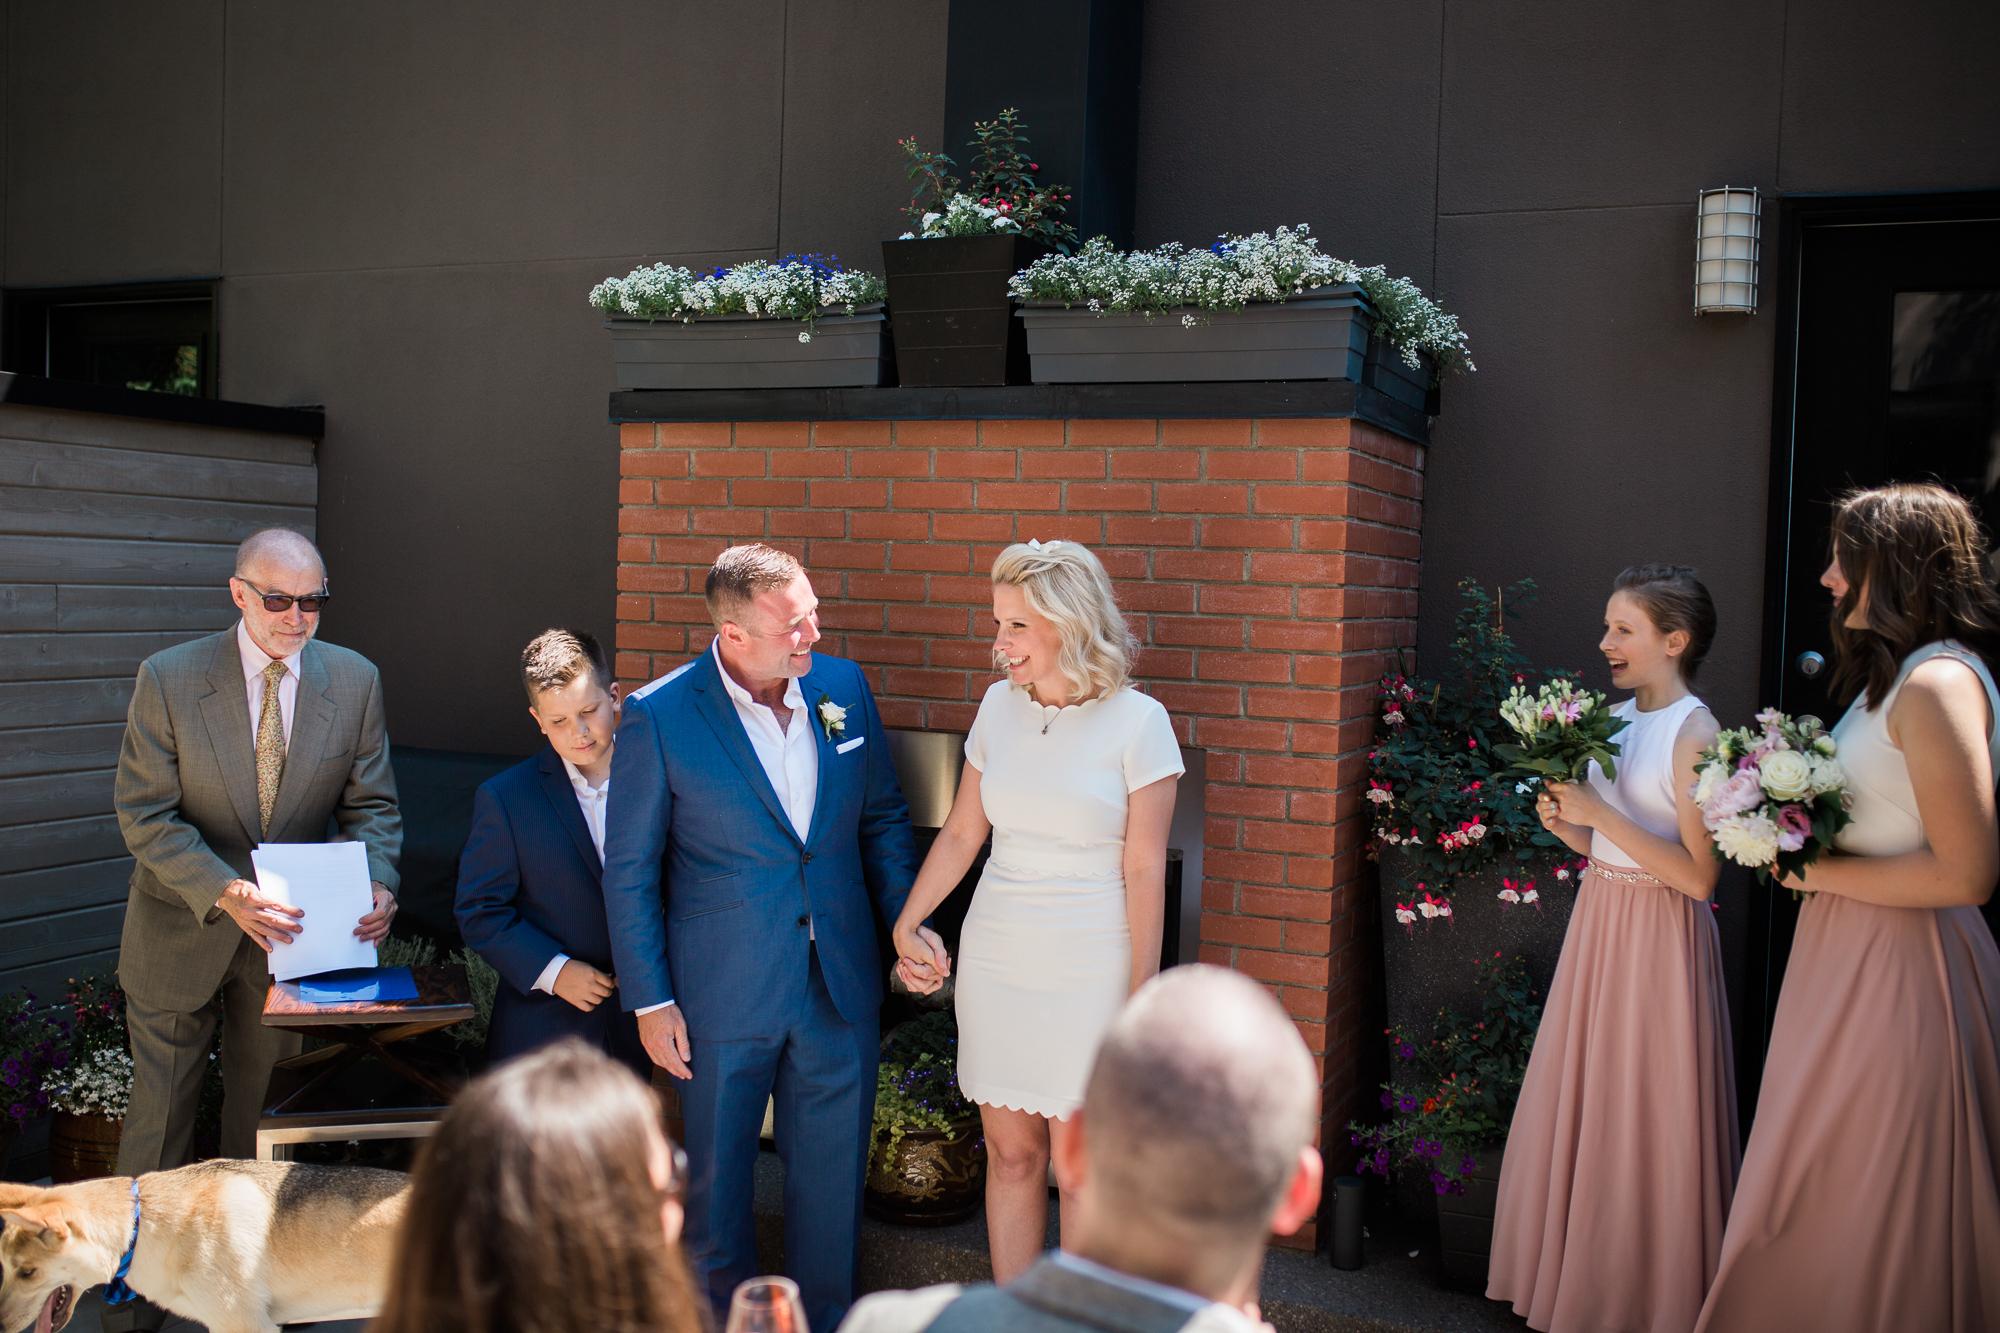 Calgary-wedding-photographer-CG-34.jpg